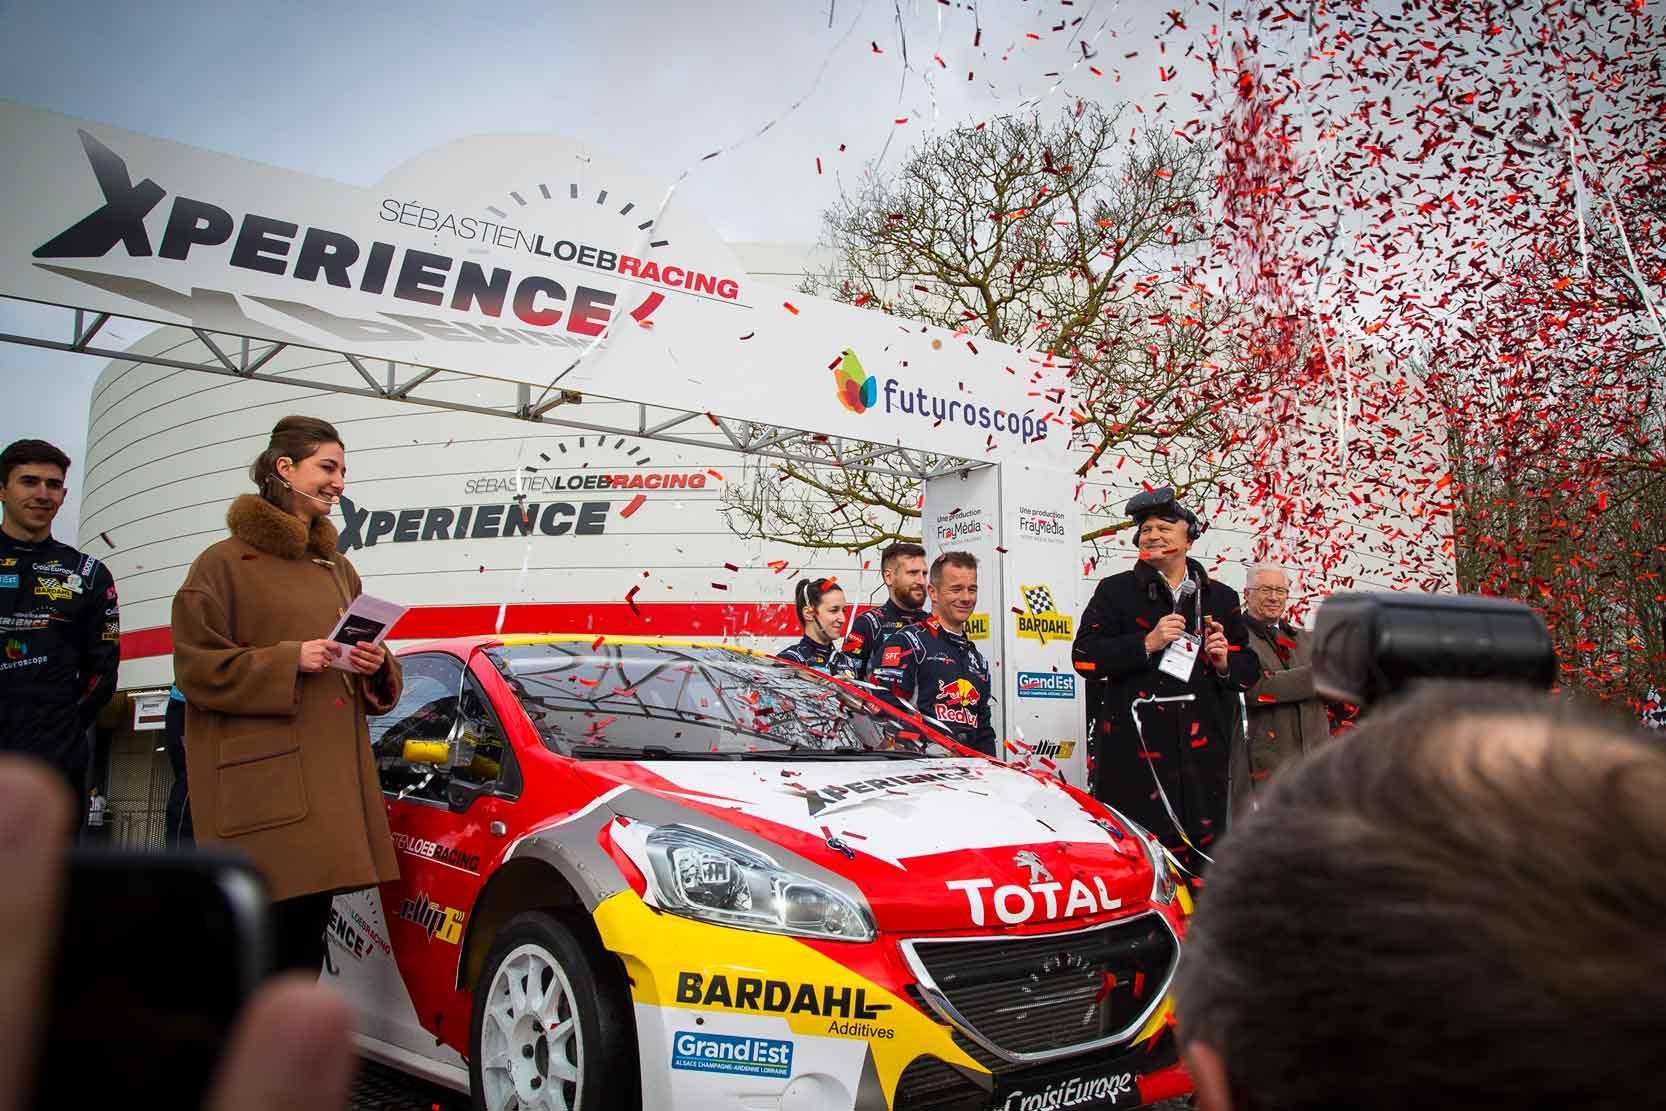 Sebastien Loeb xPerience inauguration